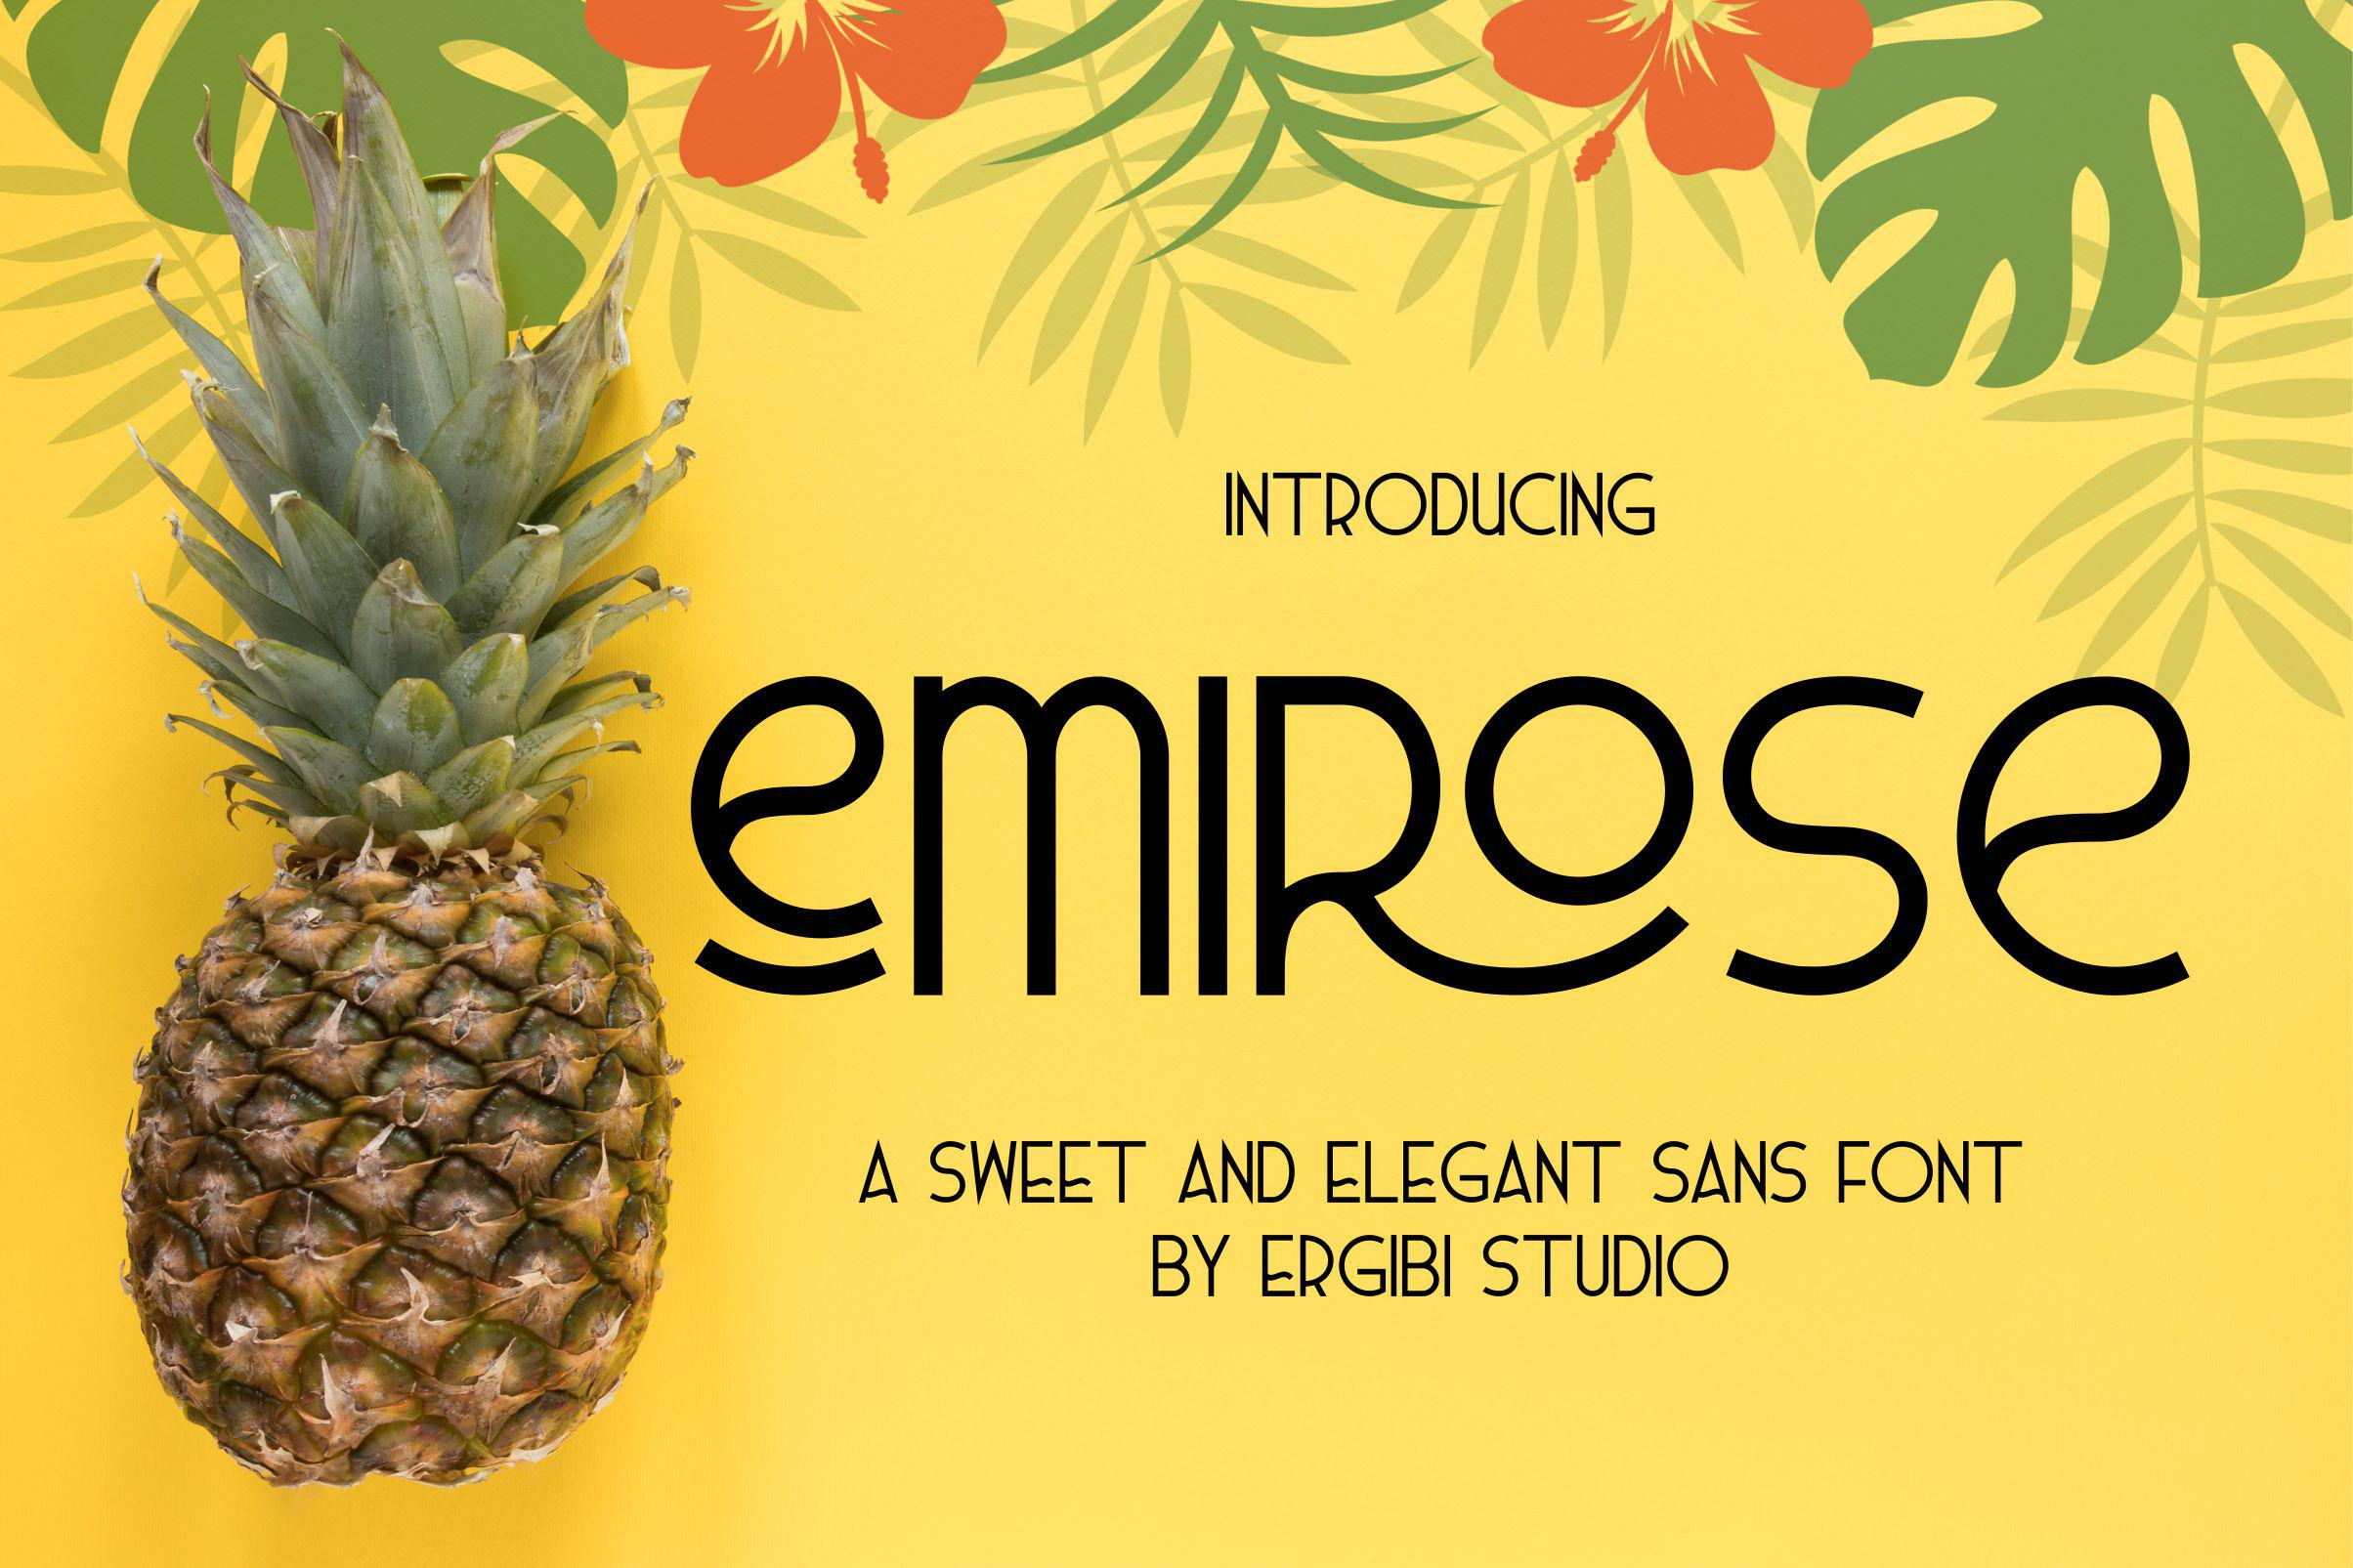 Emirose Font by ErgibiStudio